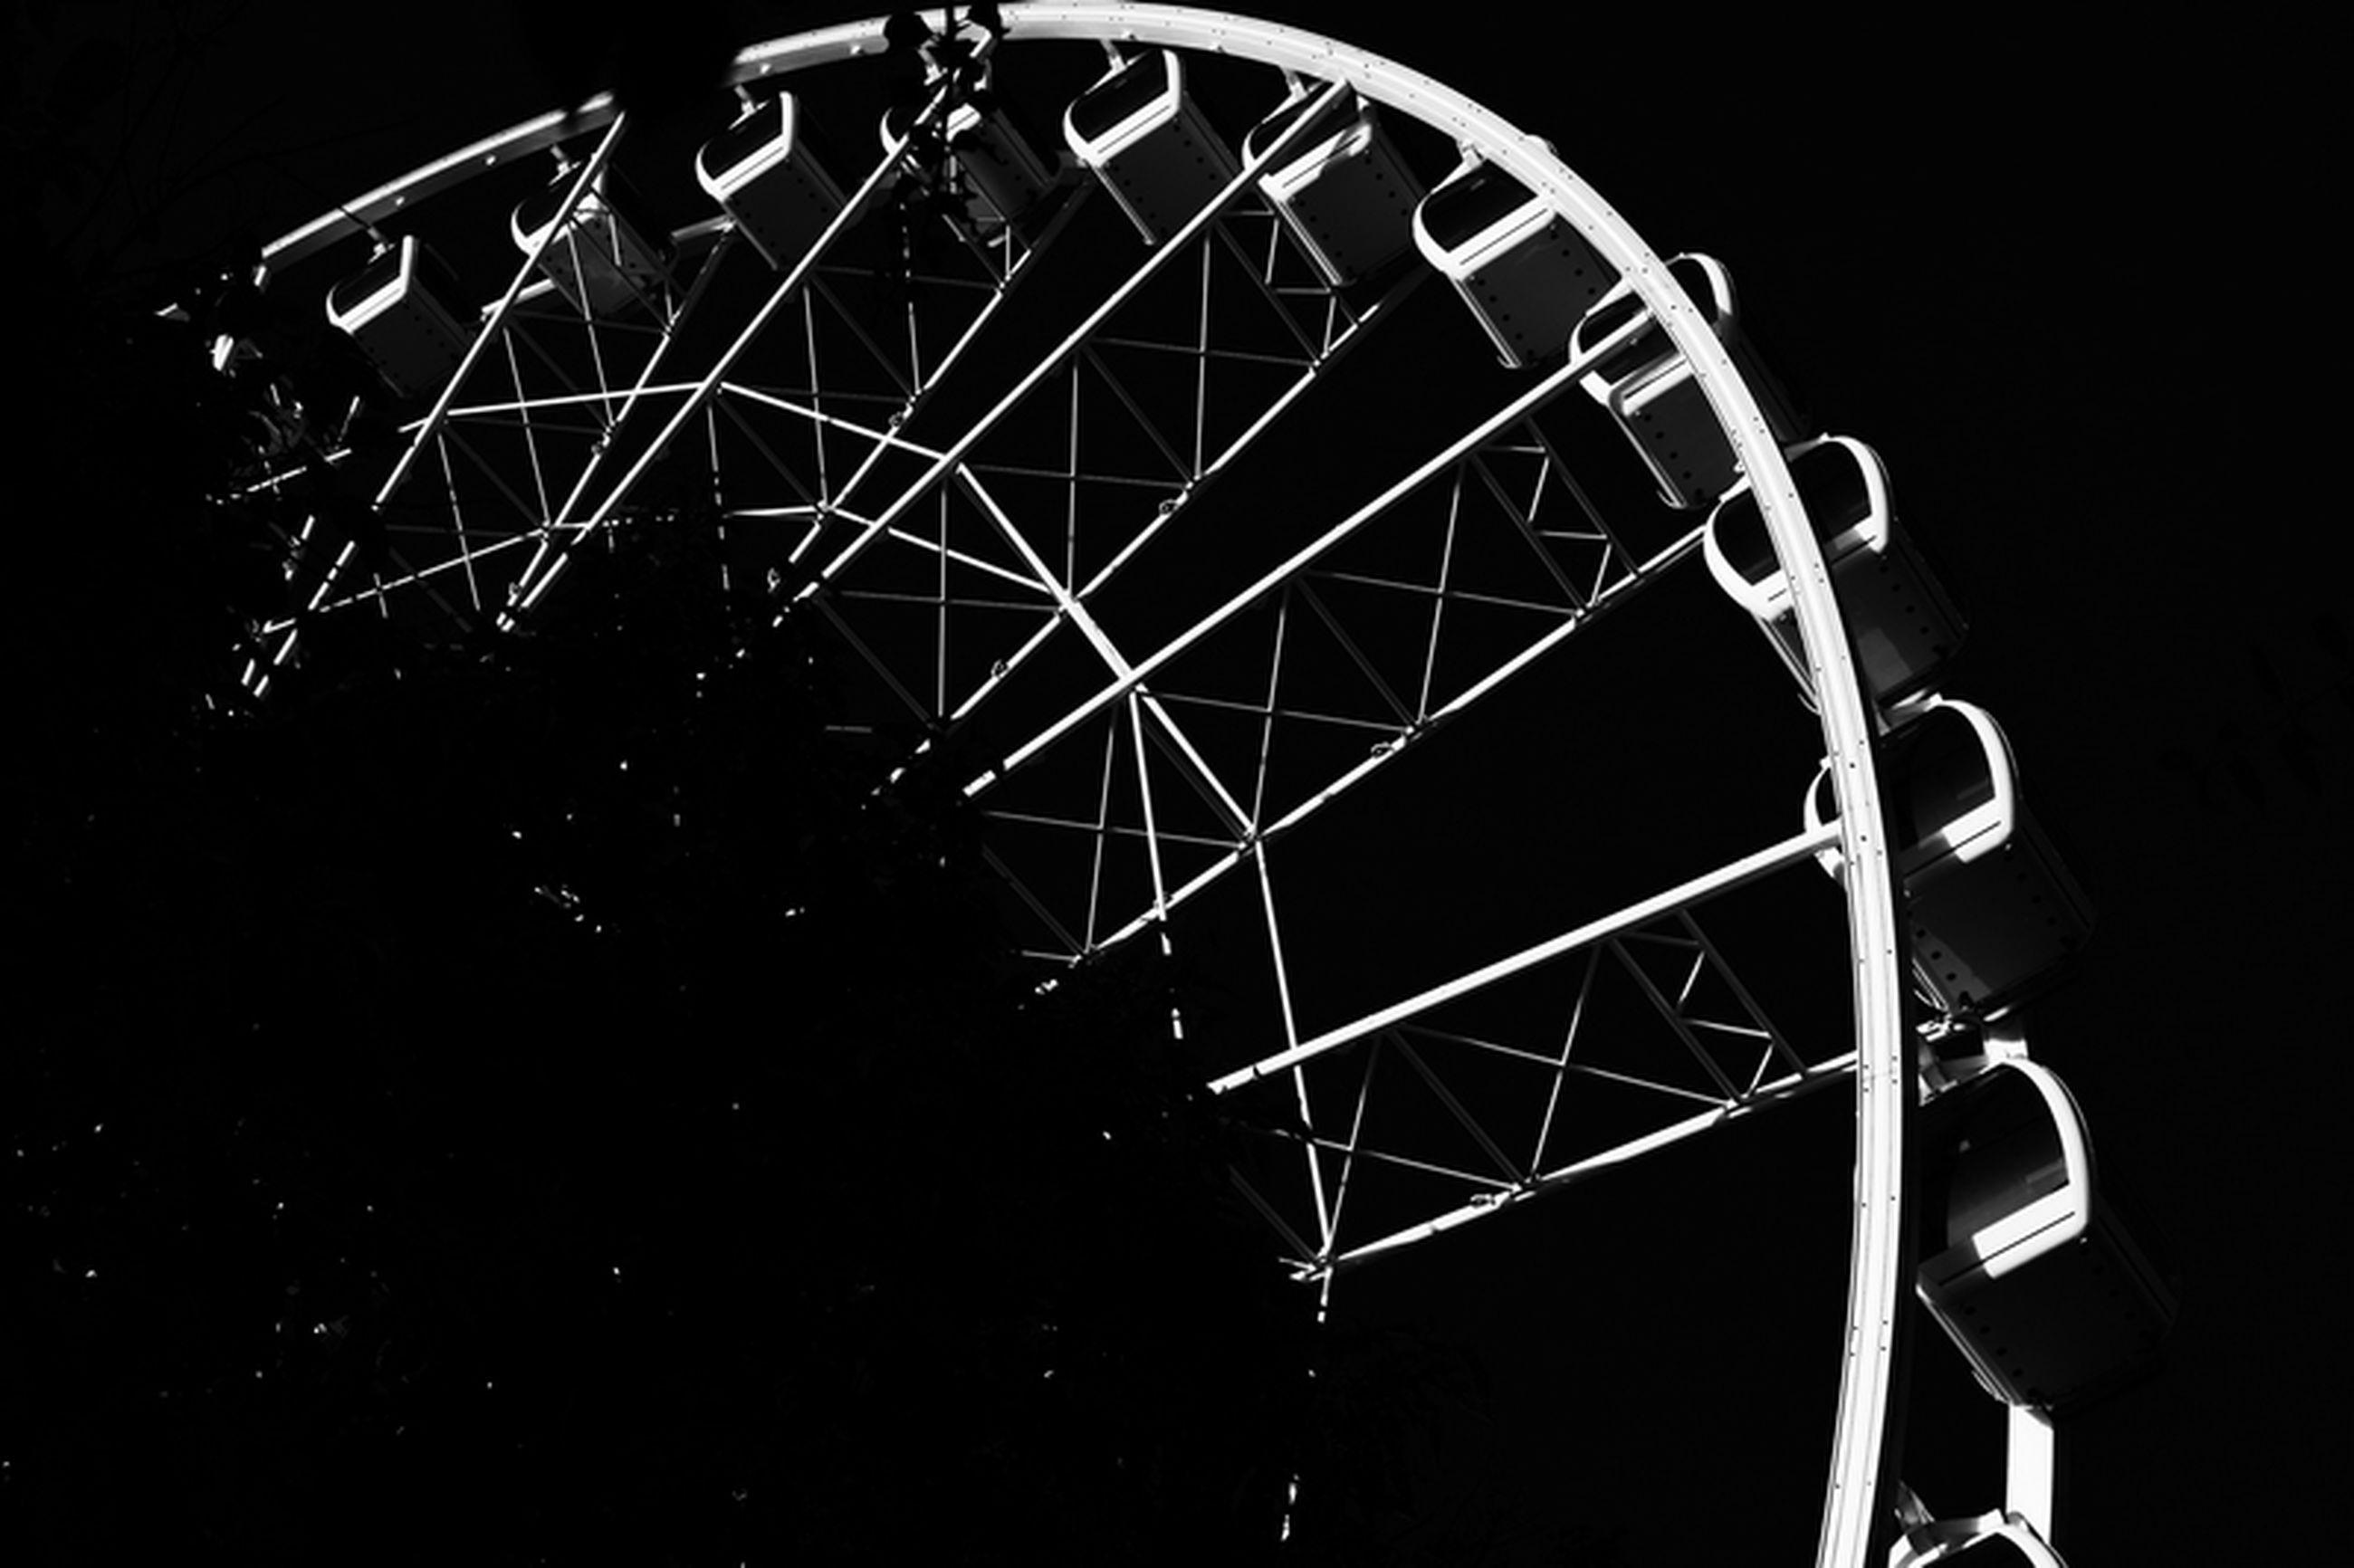 low angle view, ferris wheel, arts culture and entertainment, amusement park, metal, amusement park ride, night, circle, illuminated, built structure, metallic, geometric shape, clear sky, no people, sky, pattern, outdoors, architecture, shape